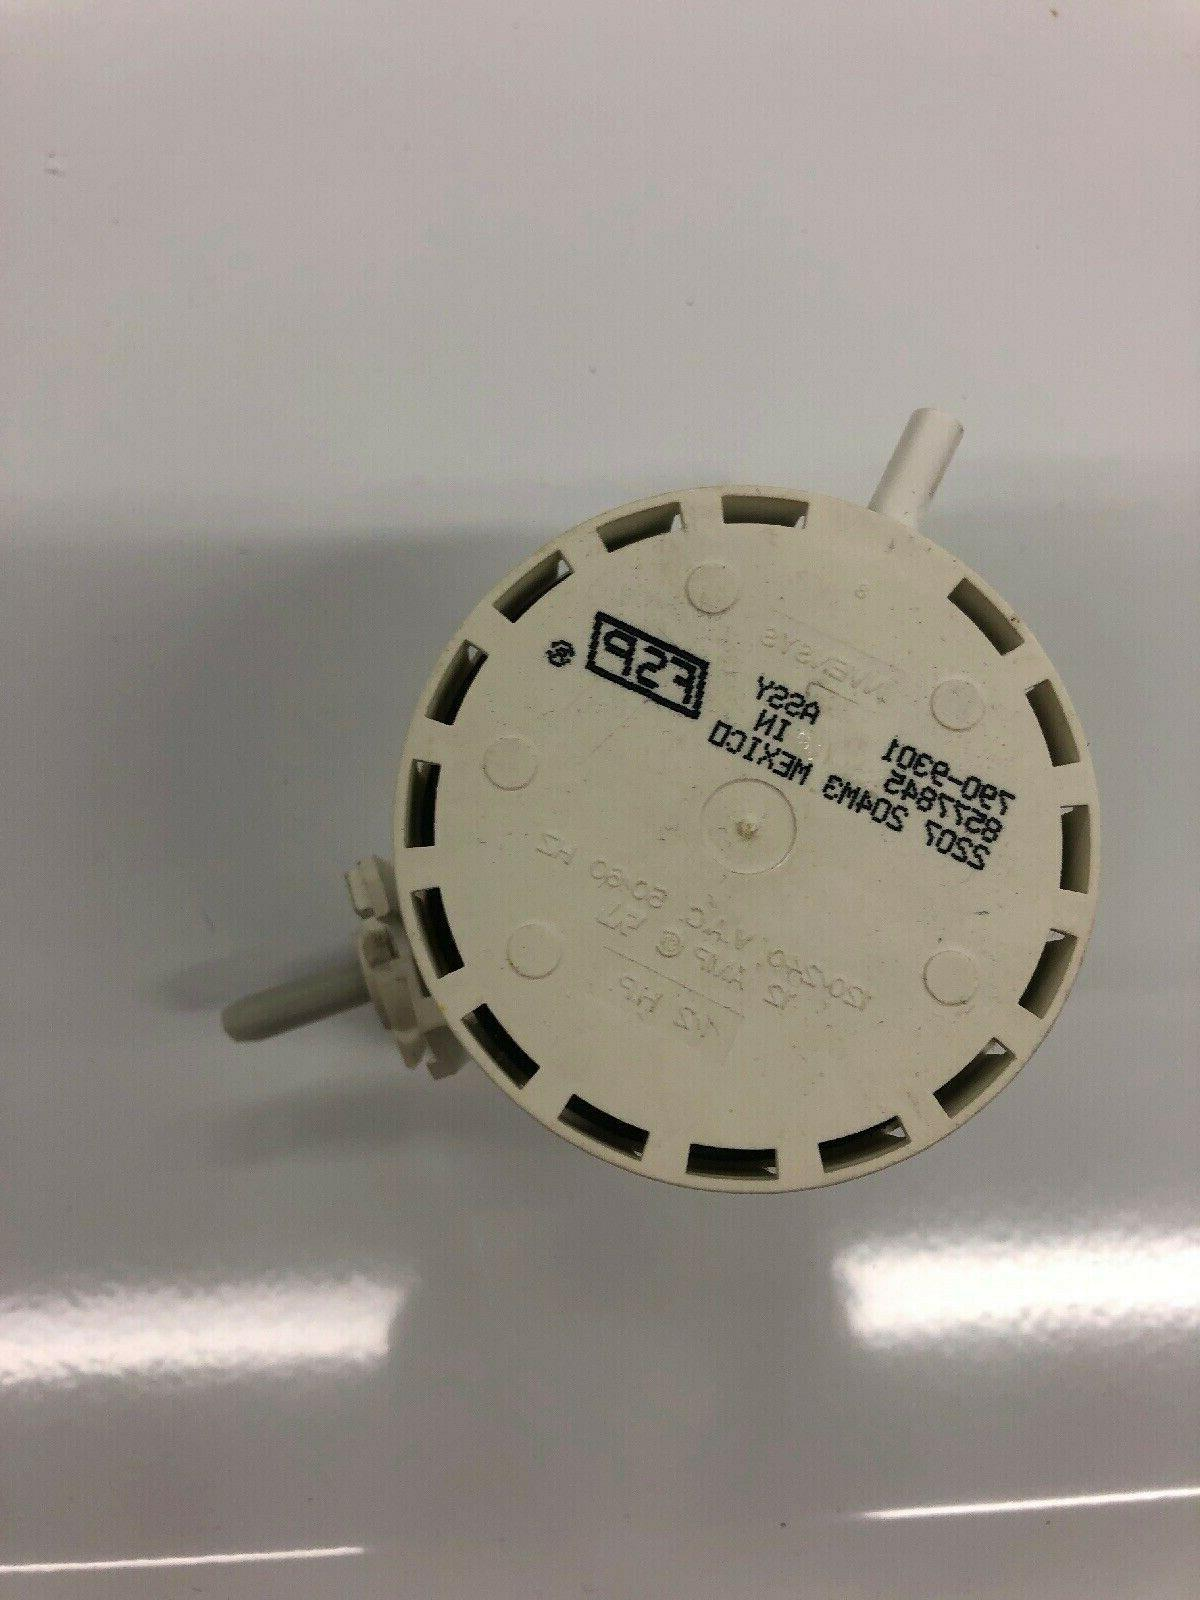 DELIVERY 2-3 DAYS-W10337781 Whirlpool Washer Pressure Switch W10337781